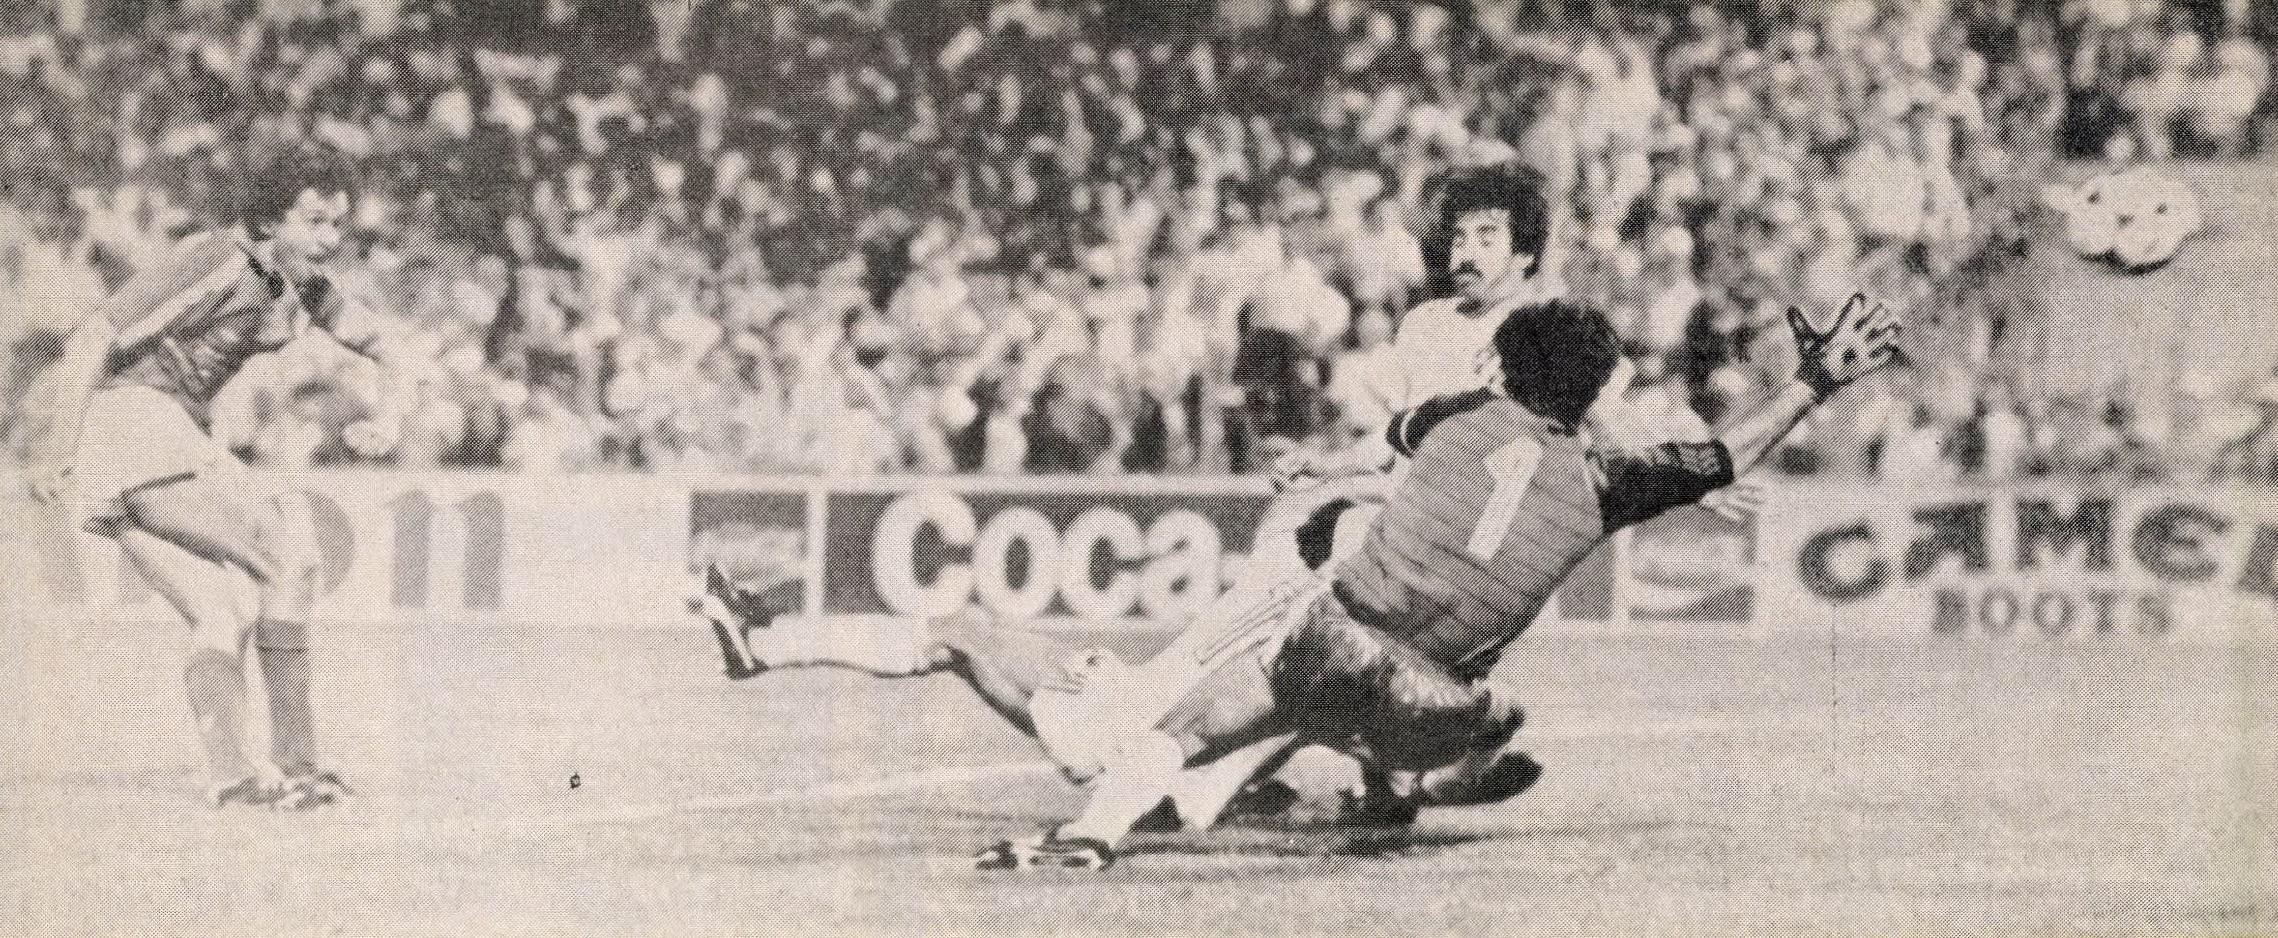 idokapszula_1984_franciaorszagi_labdarugo_europa-bajnoksag_elodontok_es_a_donto_franciaorszag_portugalia_platini.jpg